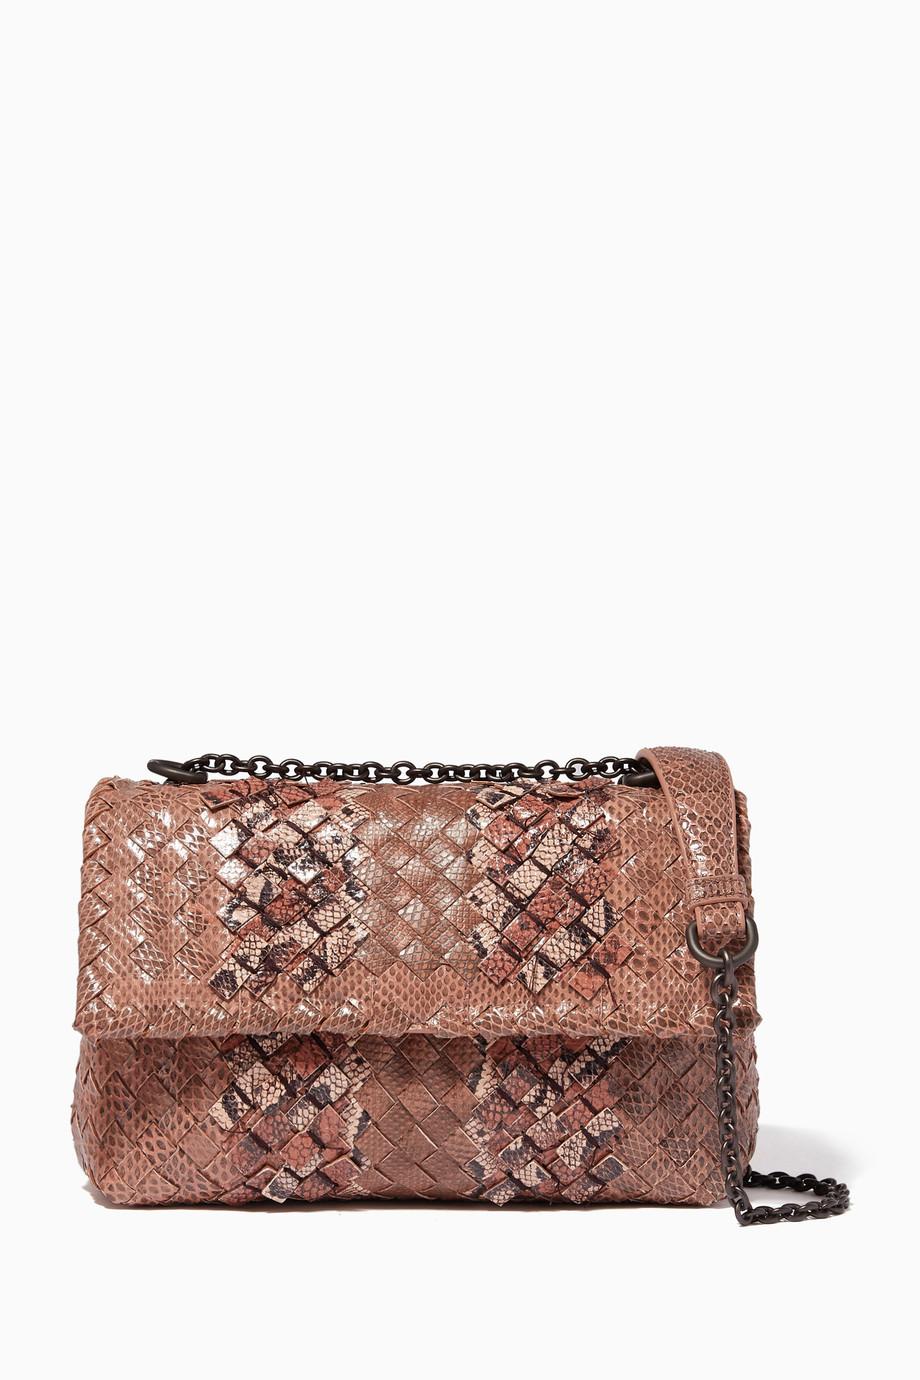 a25916eb30 Shop Bottega Veneta Pink Dahlia Baby Olimpia Shoulder Bag for Women ...